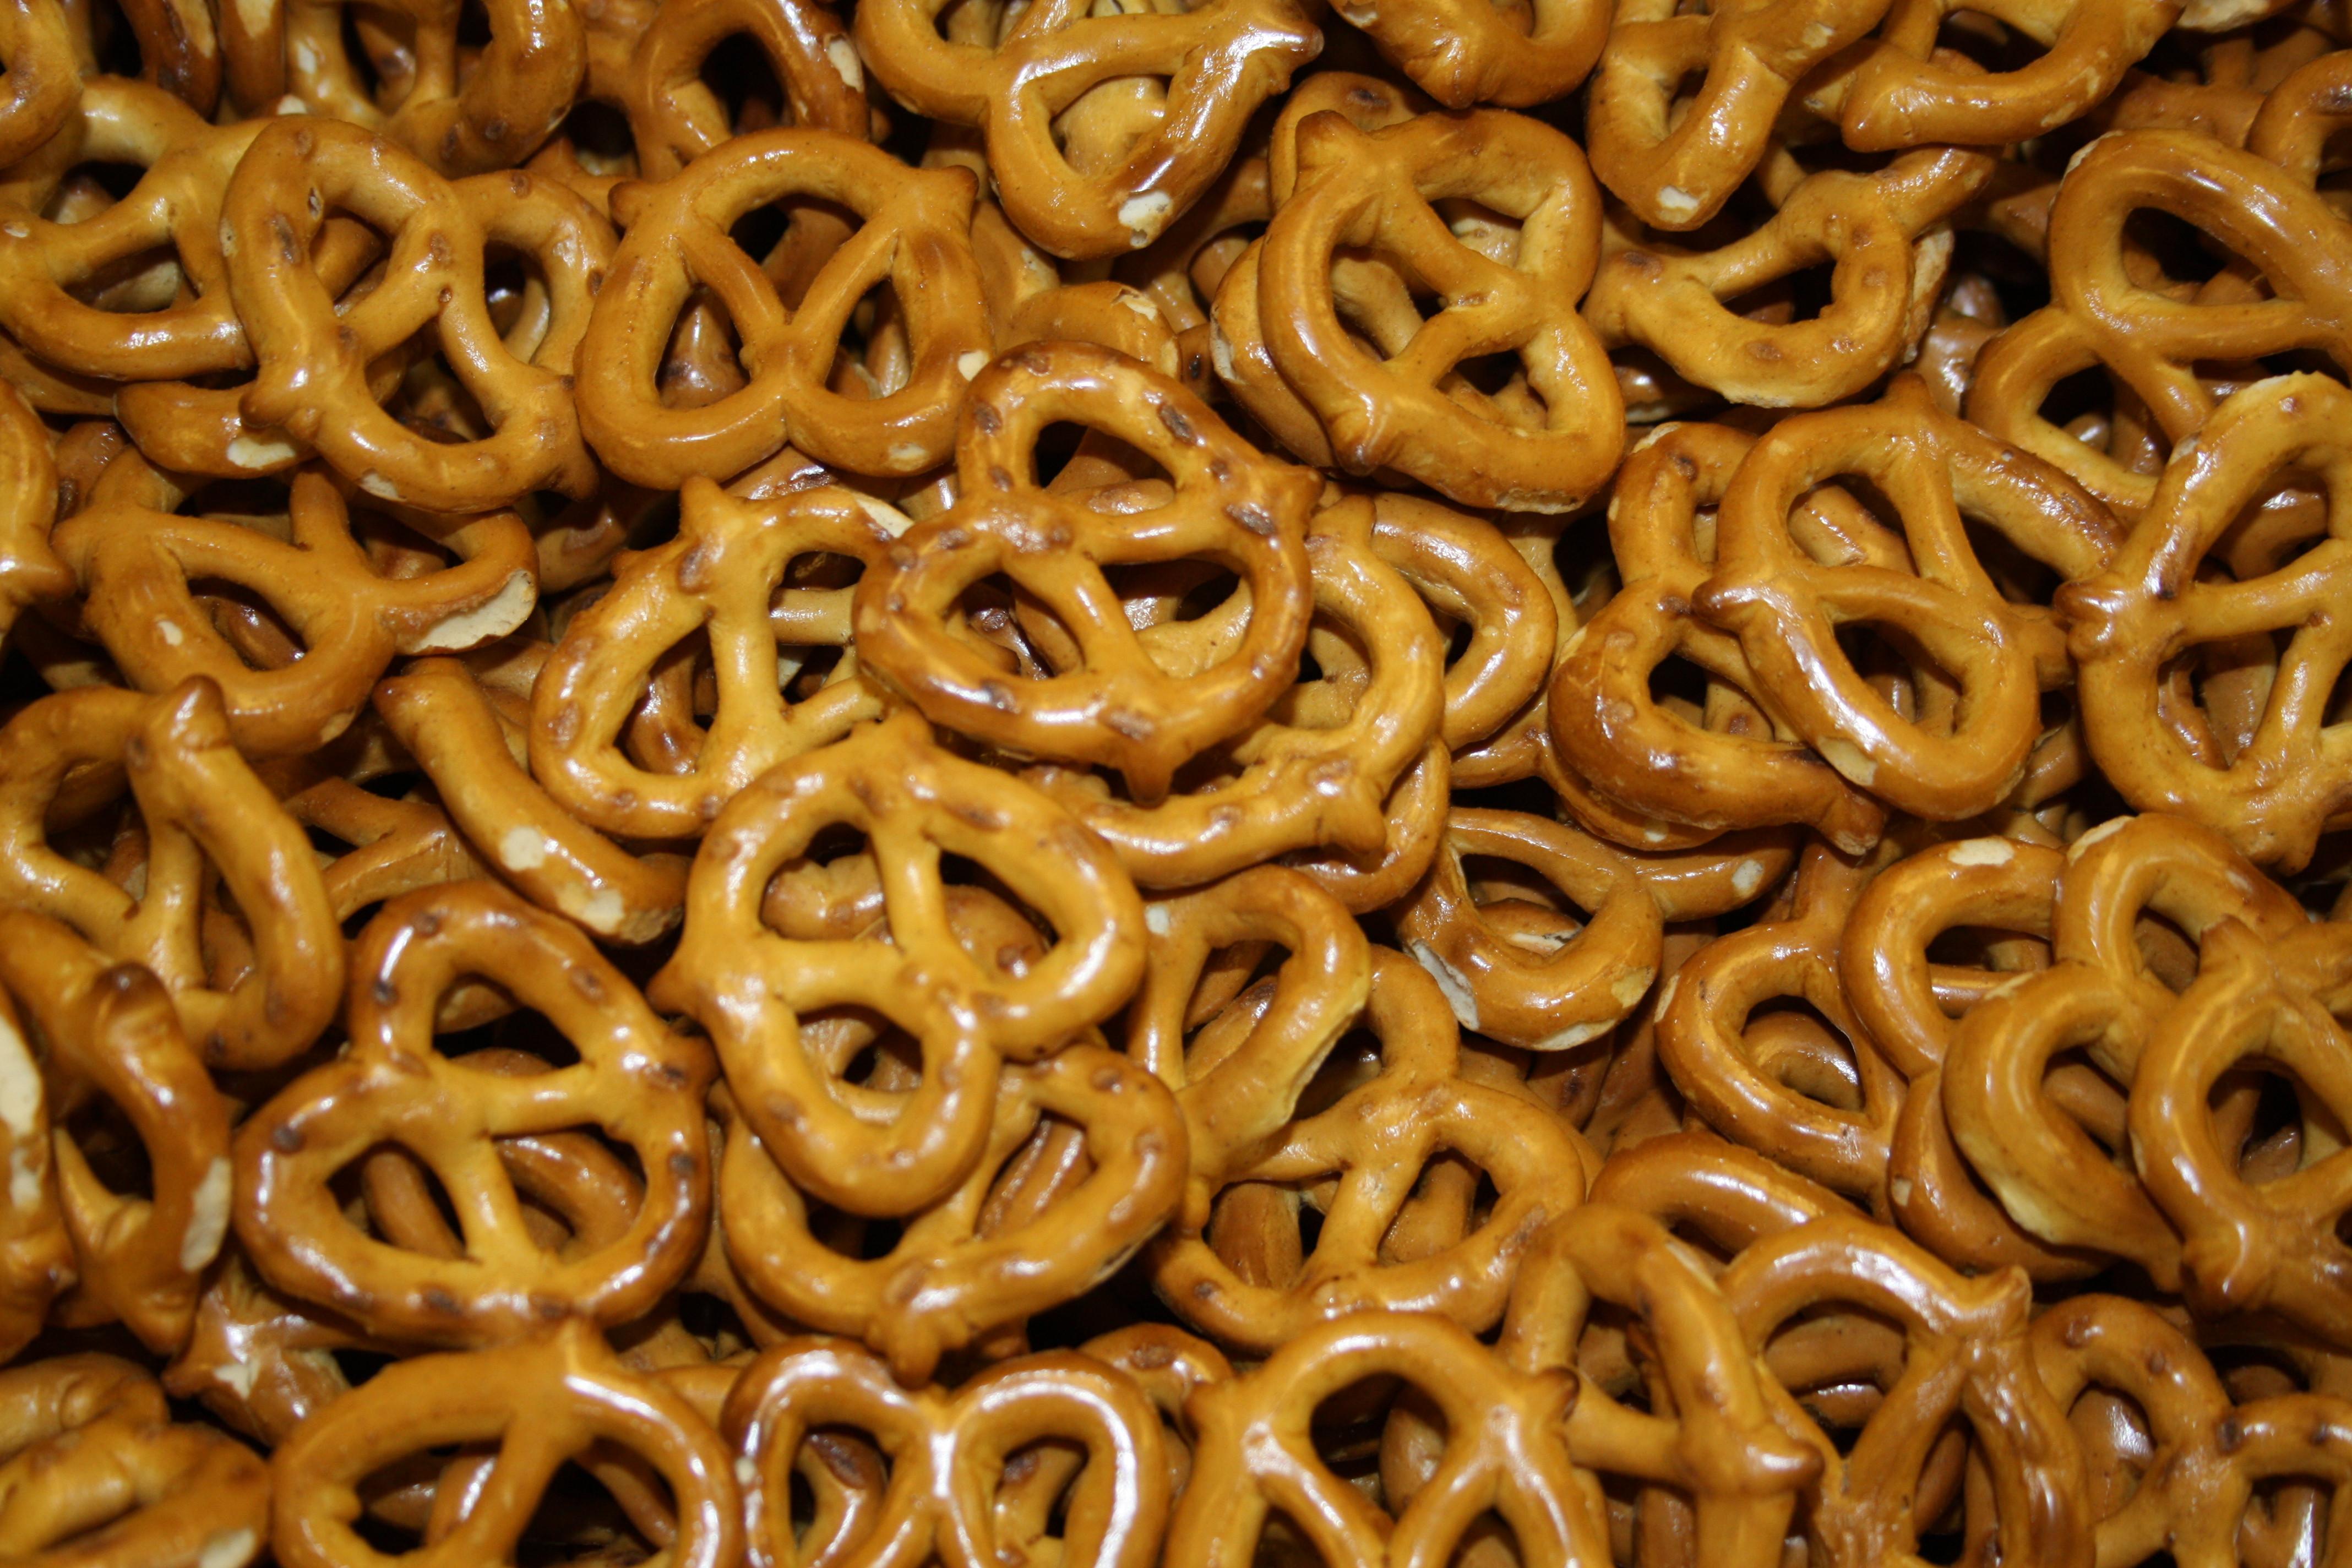 Are Unsalted Pretzels Healthy  Unsalted Pretzels